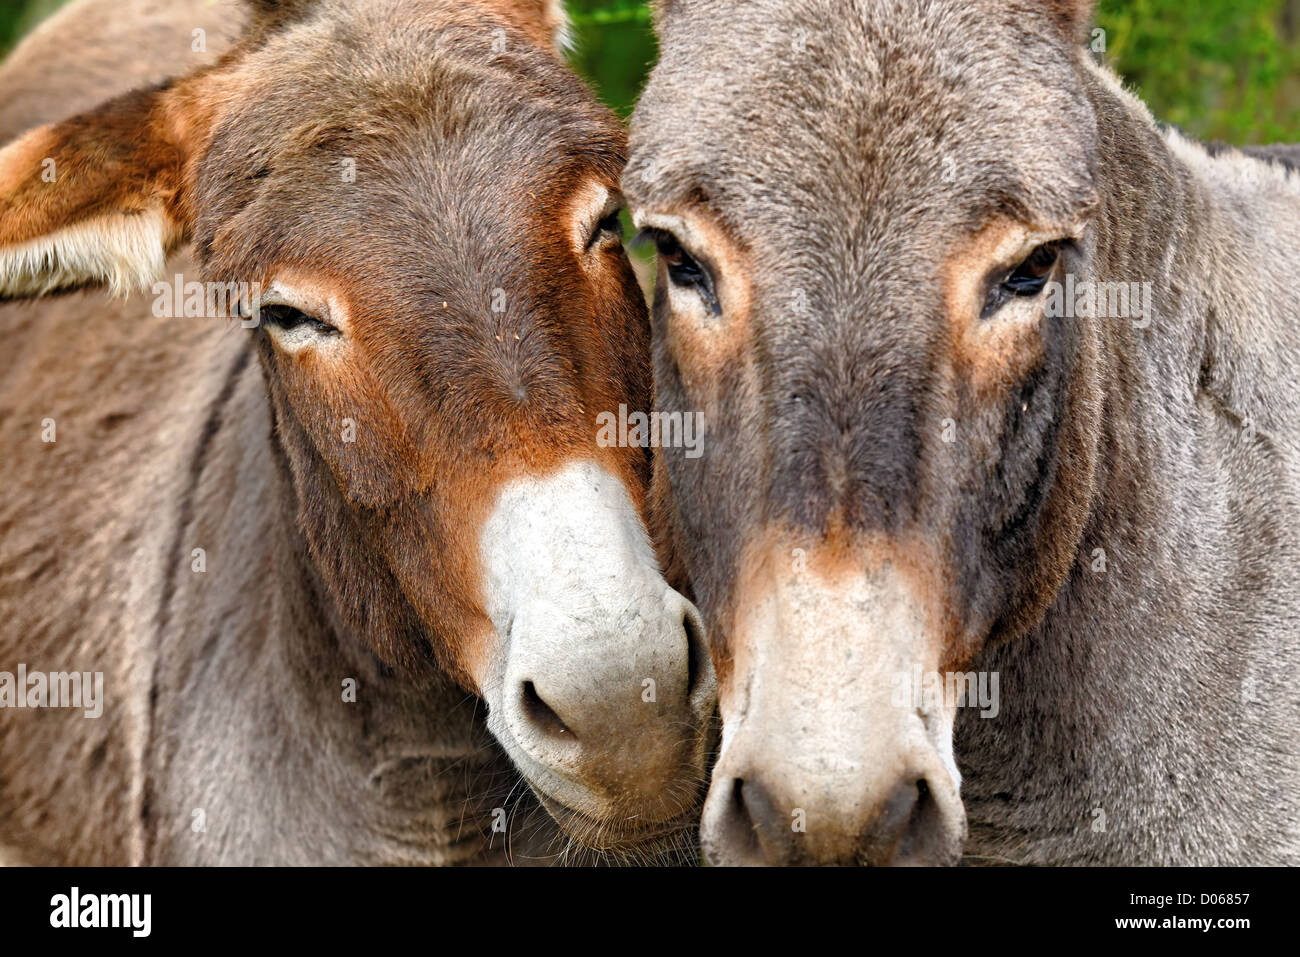 scene of tenderness between two donkey - Stock Image